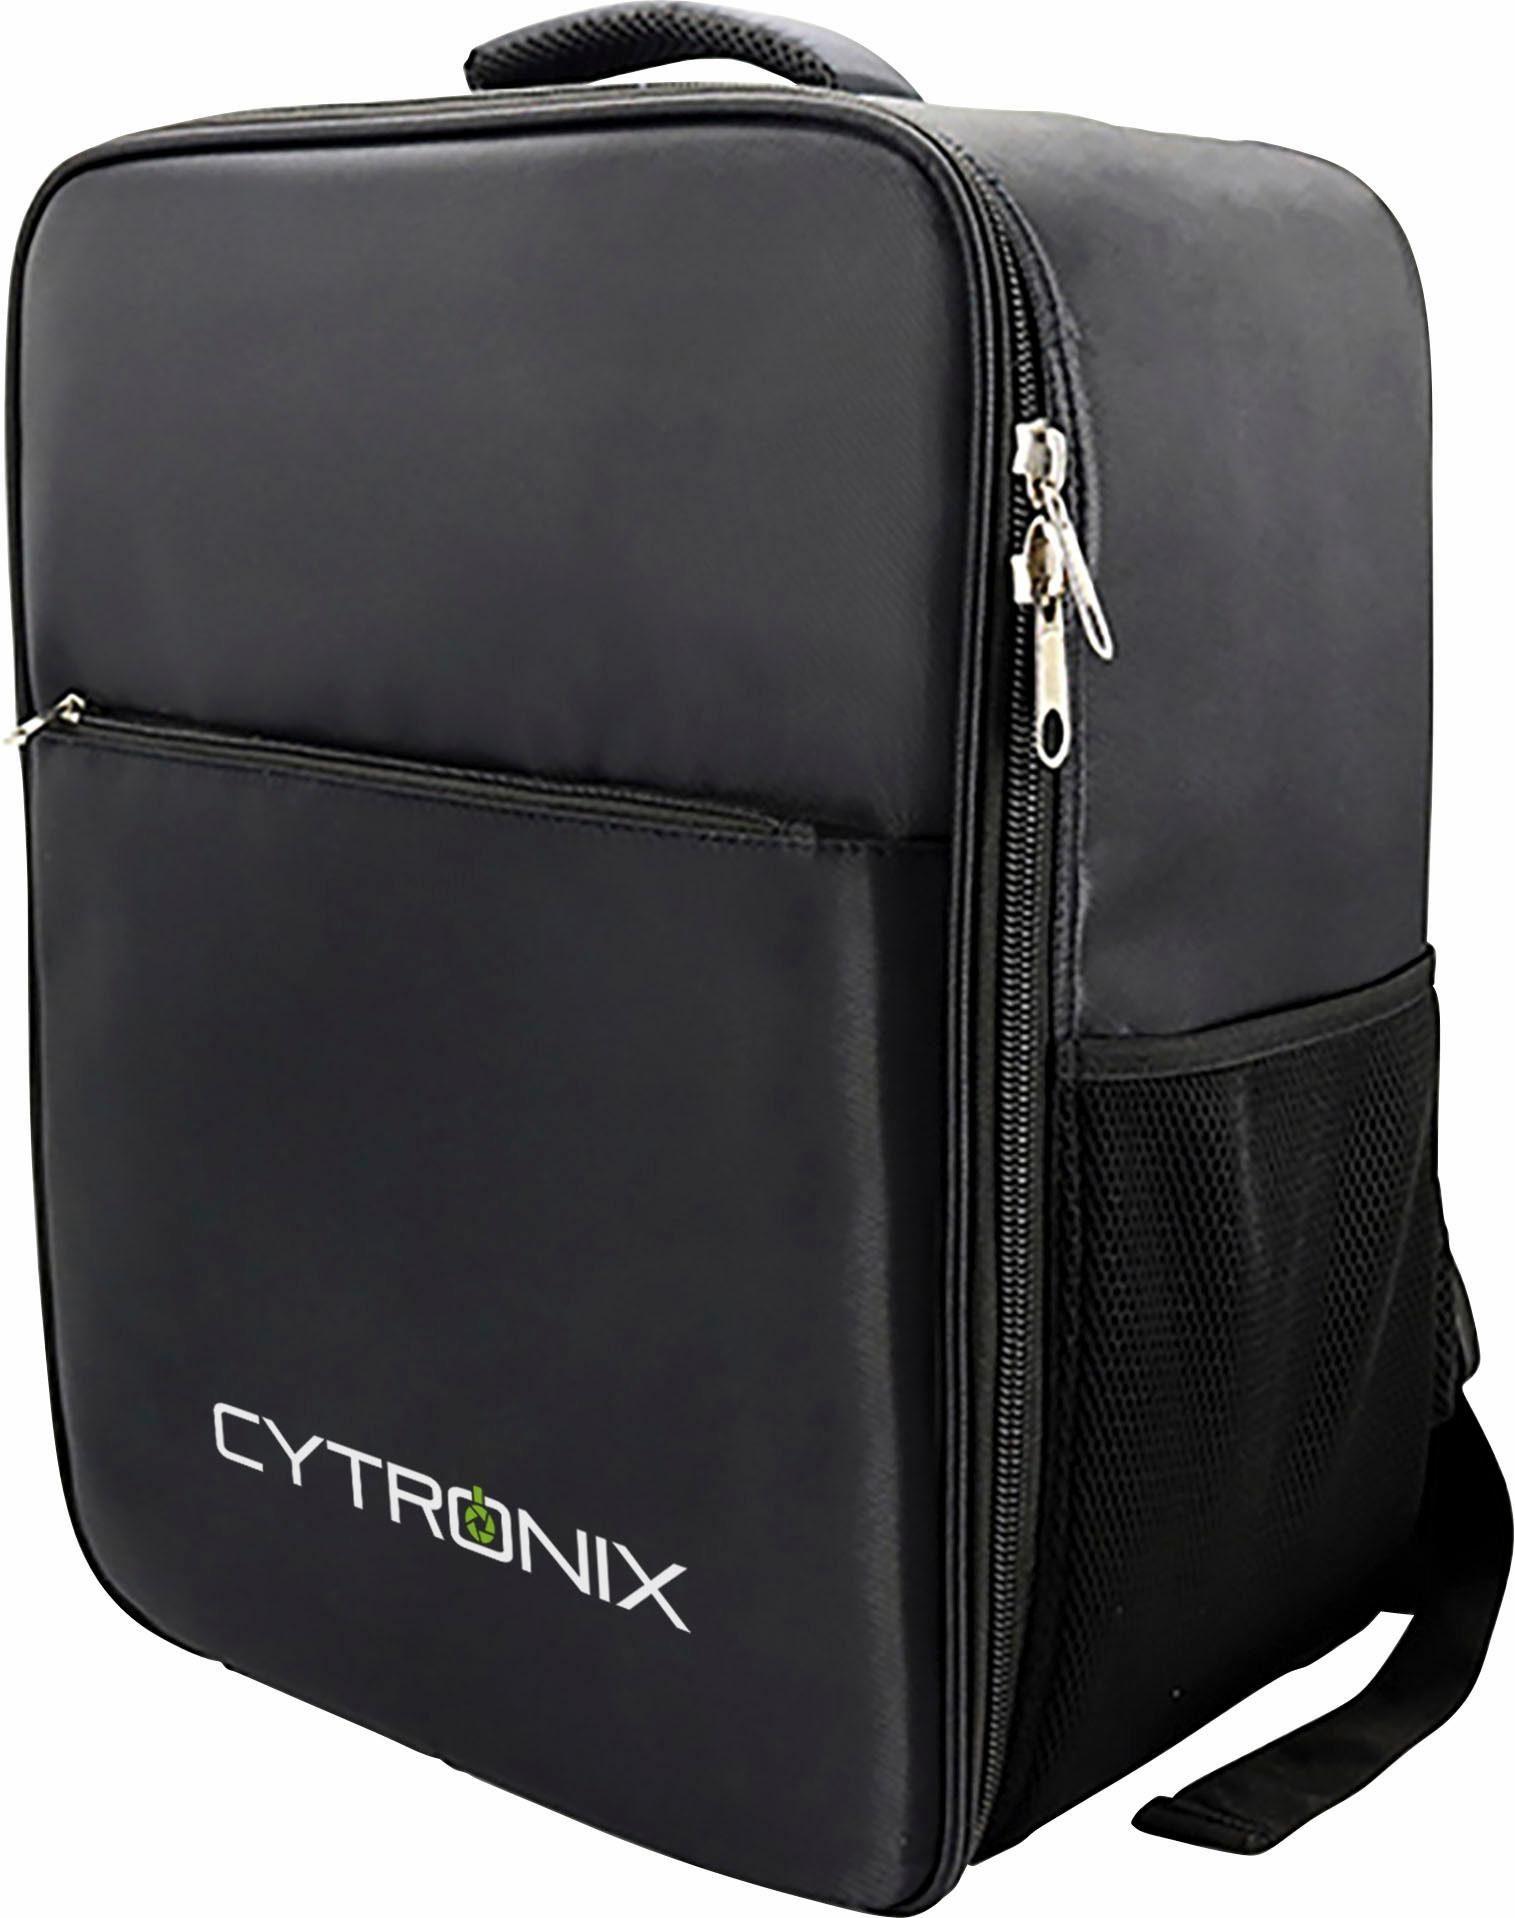 CYTRONIX DJI Phantom 3/4 Rucksack